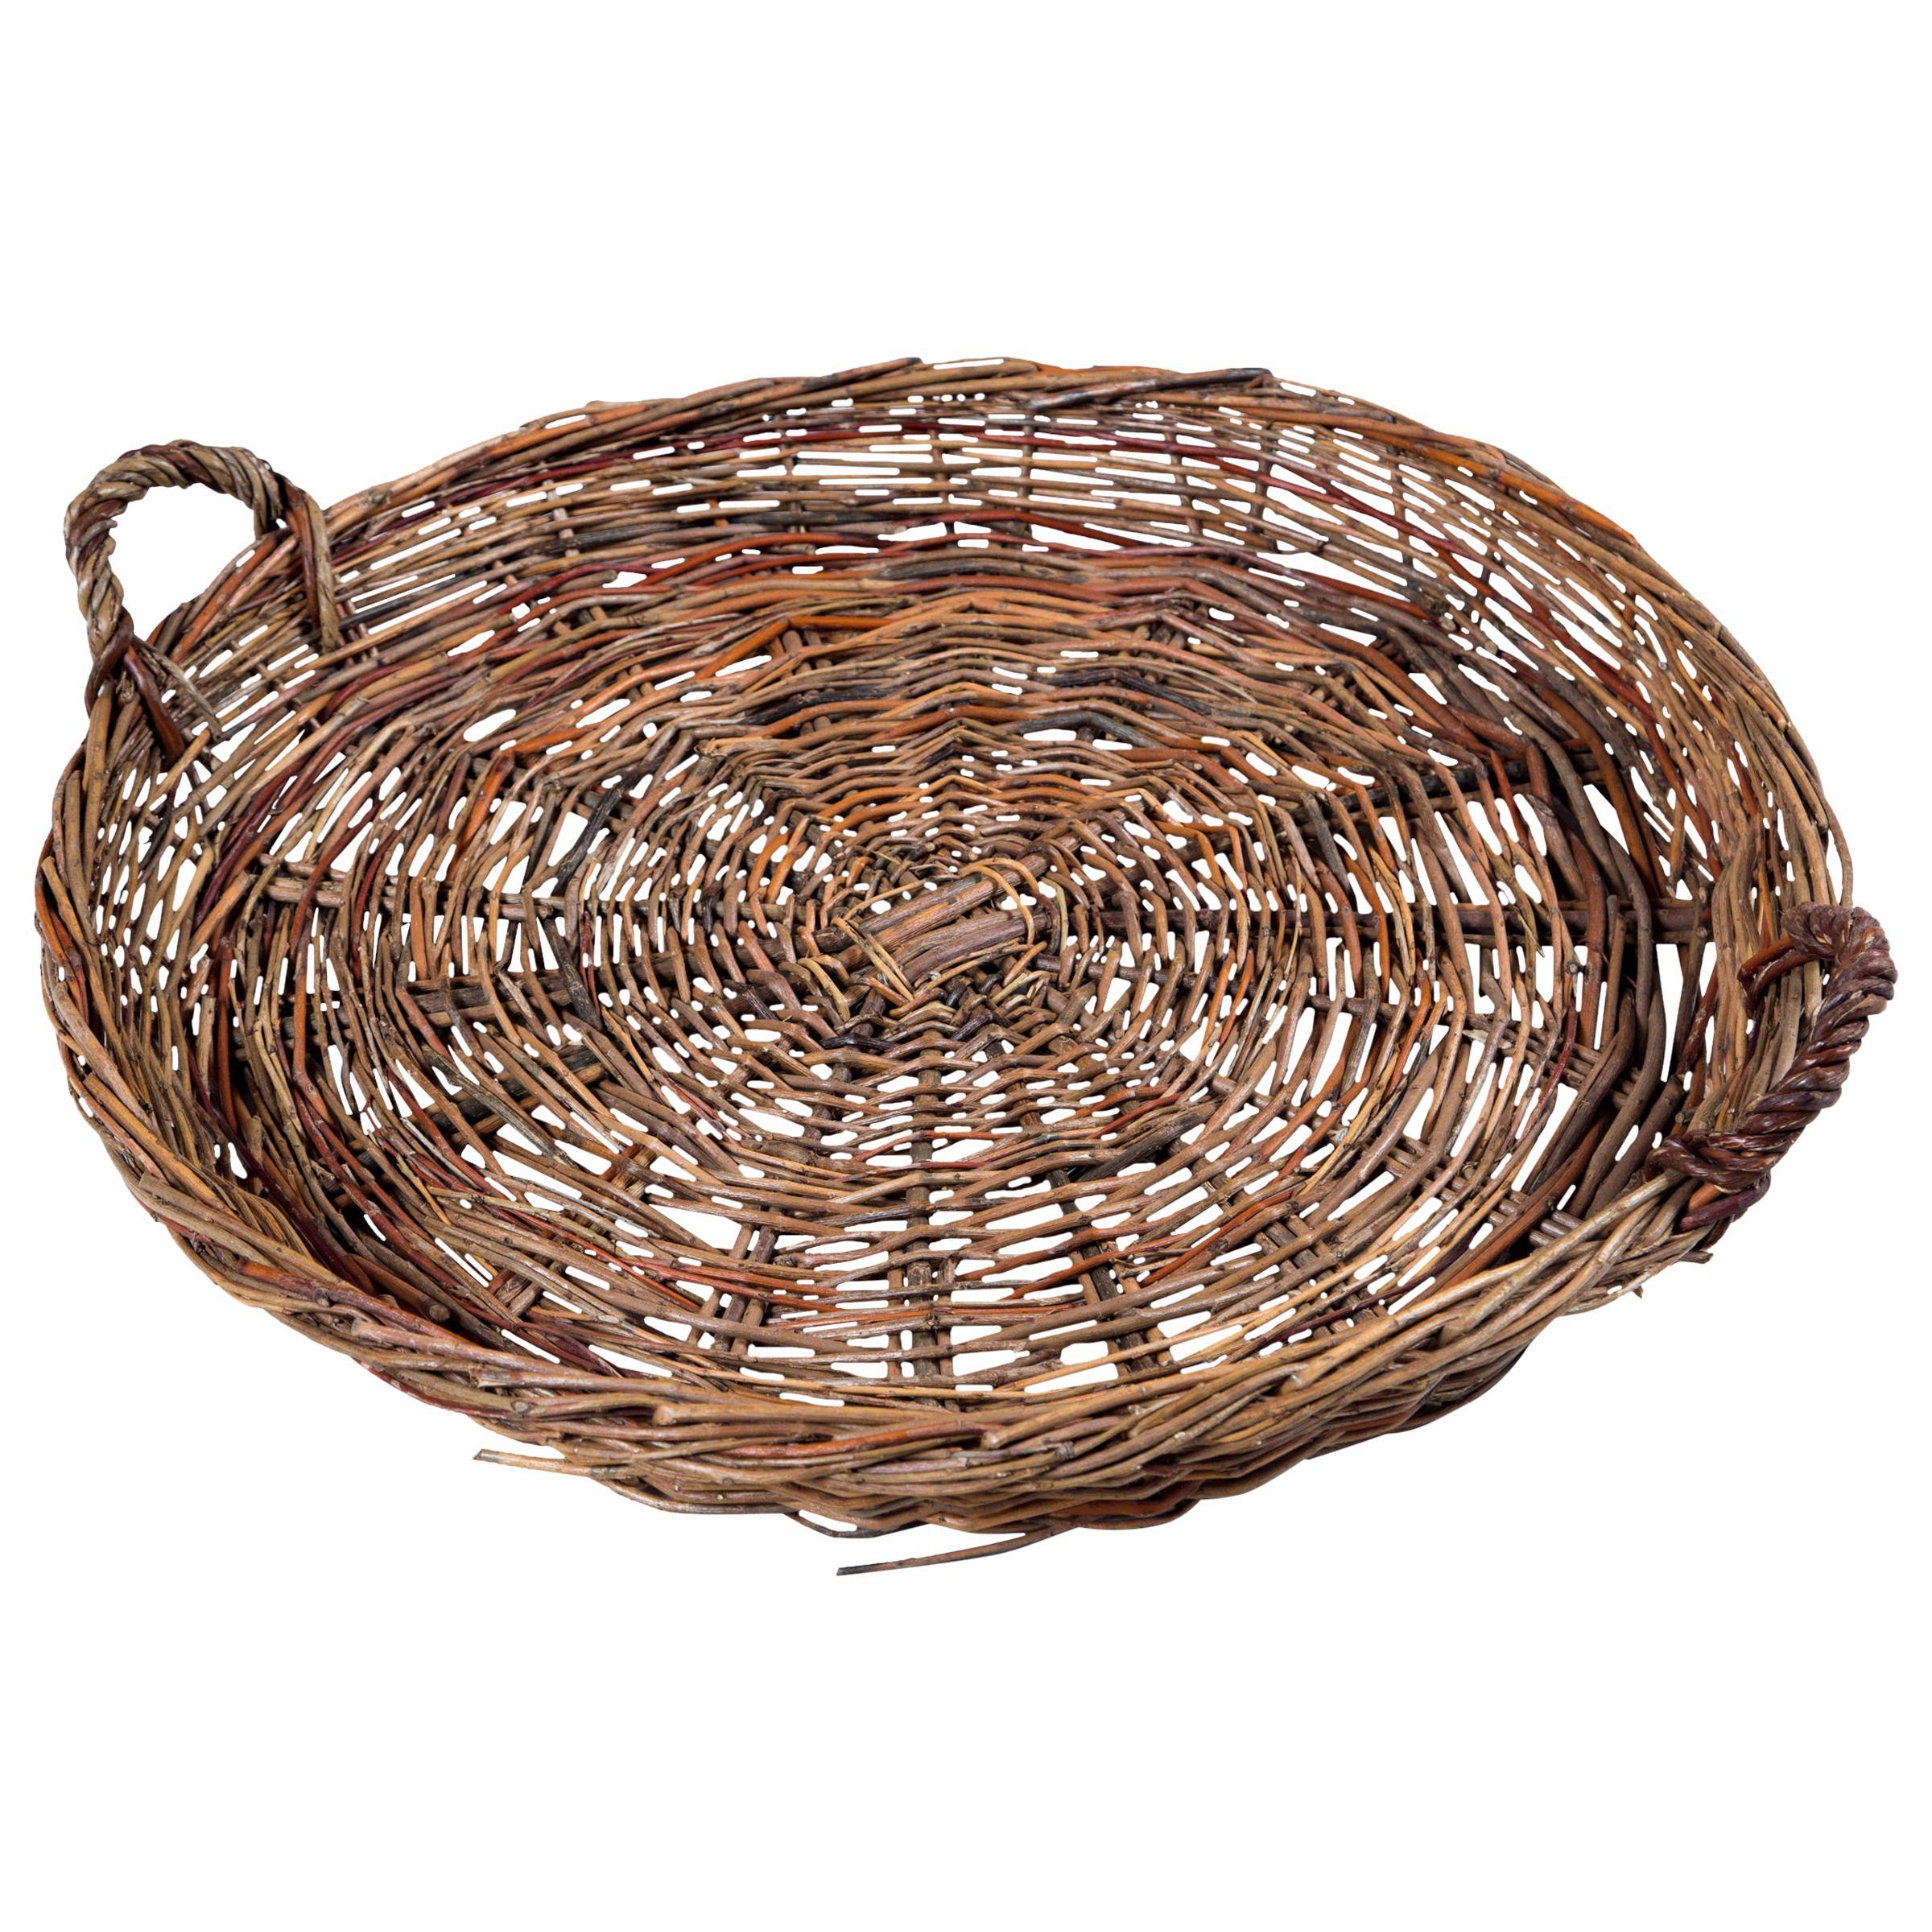 Vintage Wicker Grape Basket, France, circa 1950